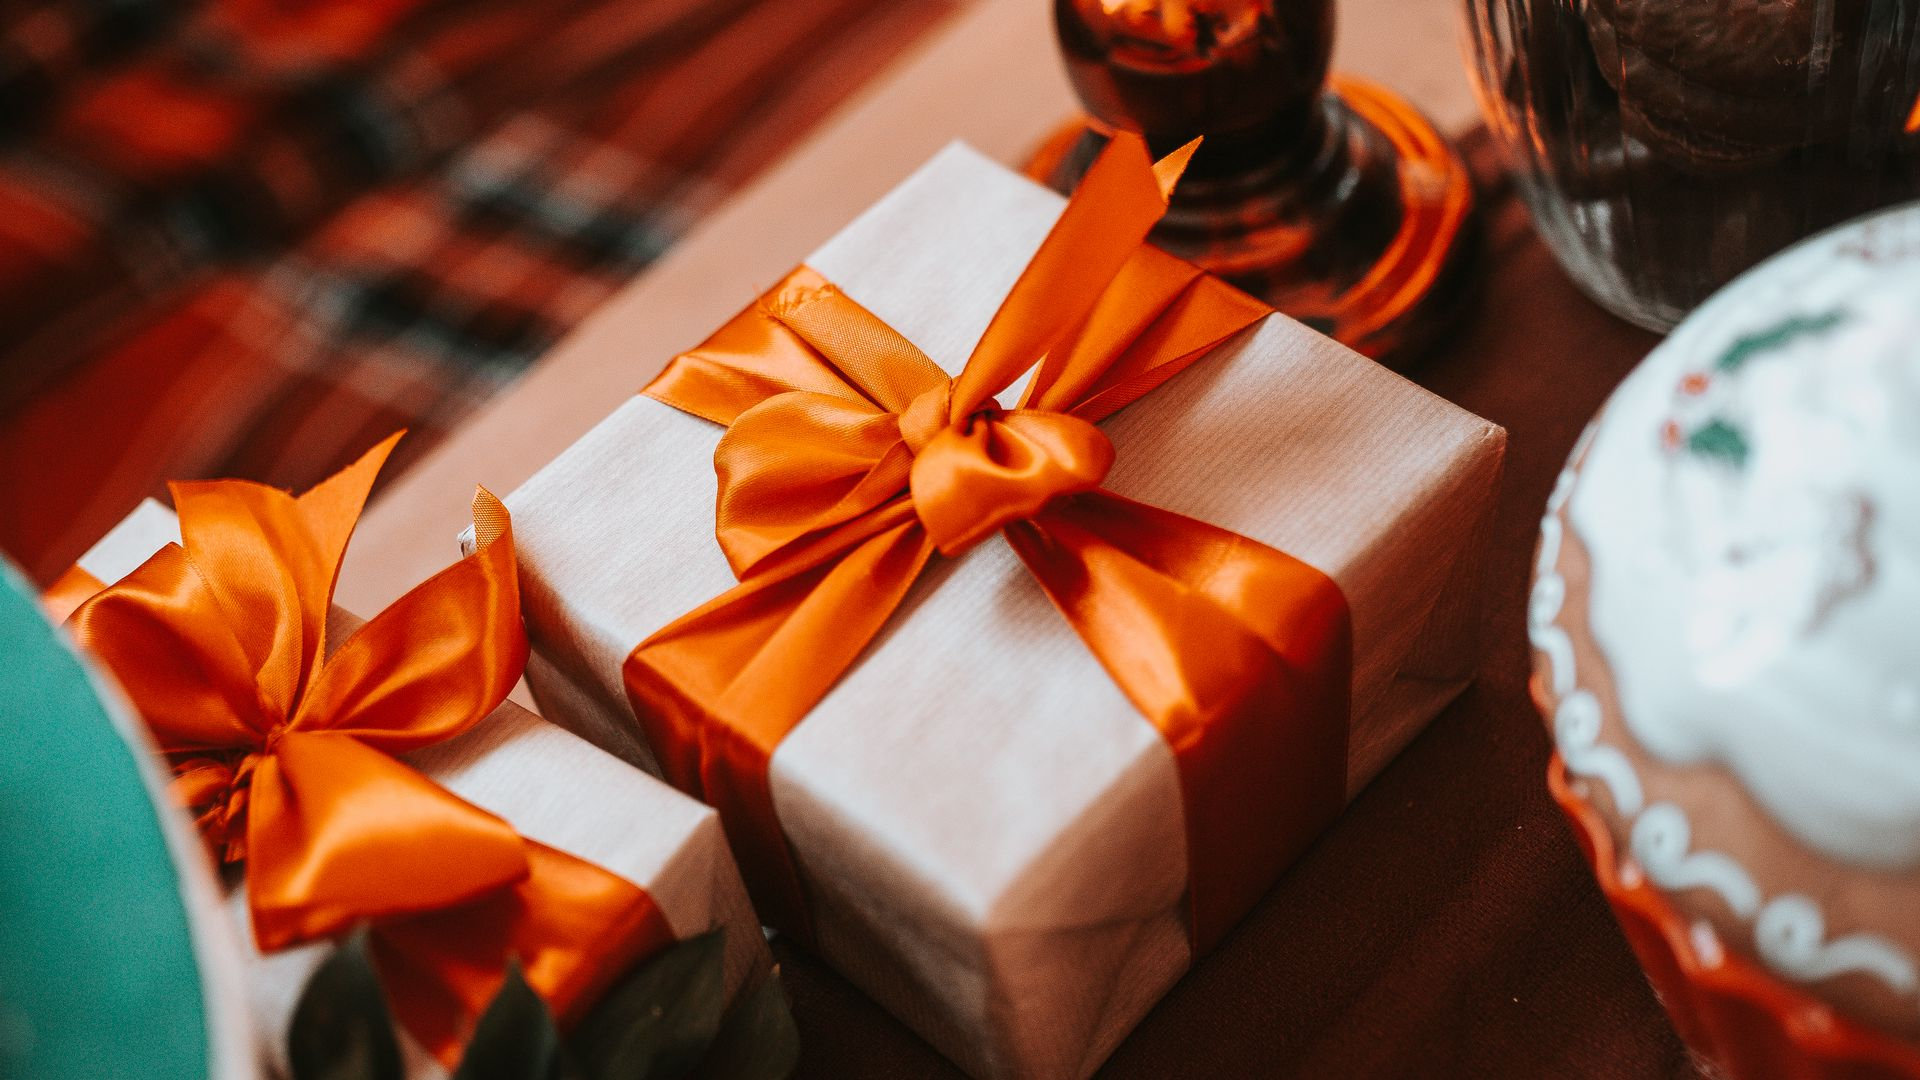 1920x1080 Wallpaper gift, box, ribbon, holiday, aesthetics